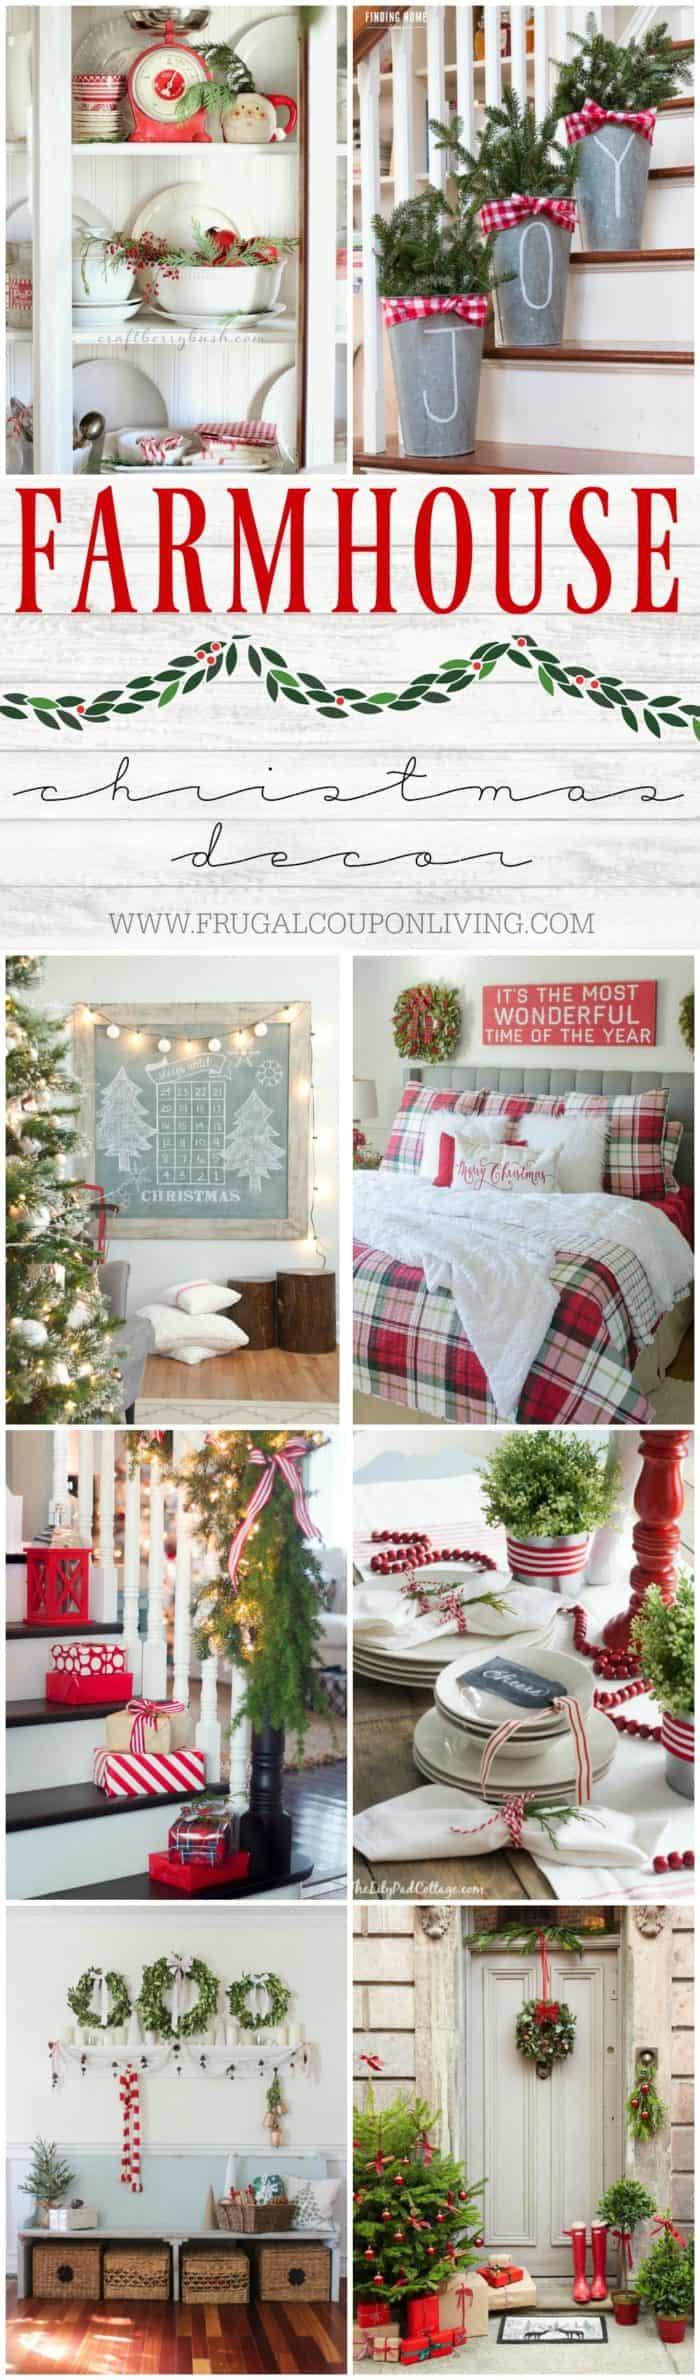 Design furnishings discount coupons